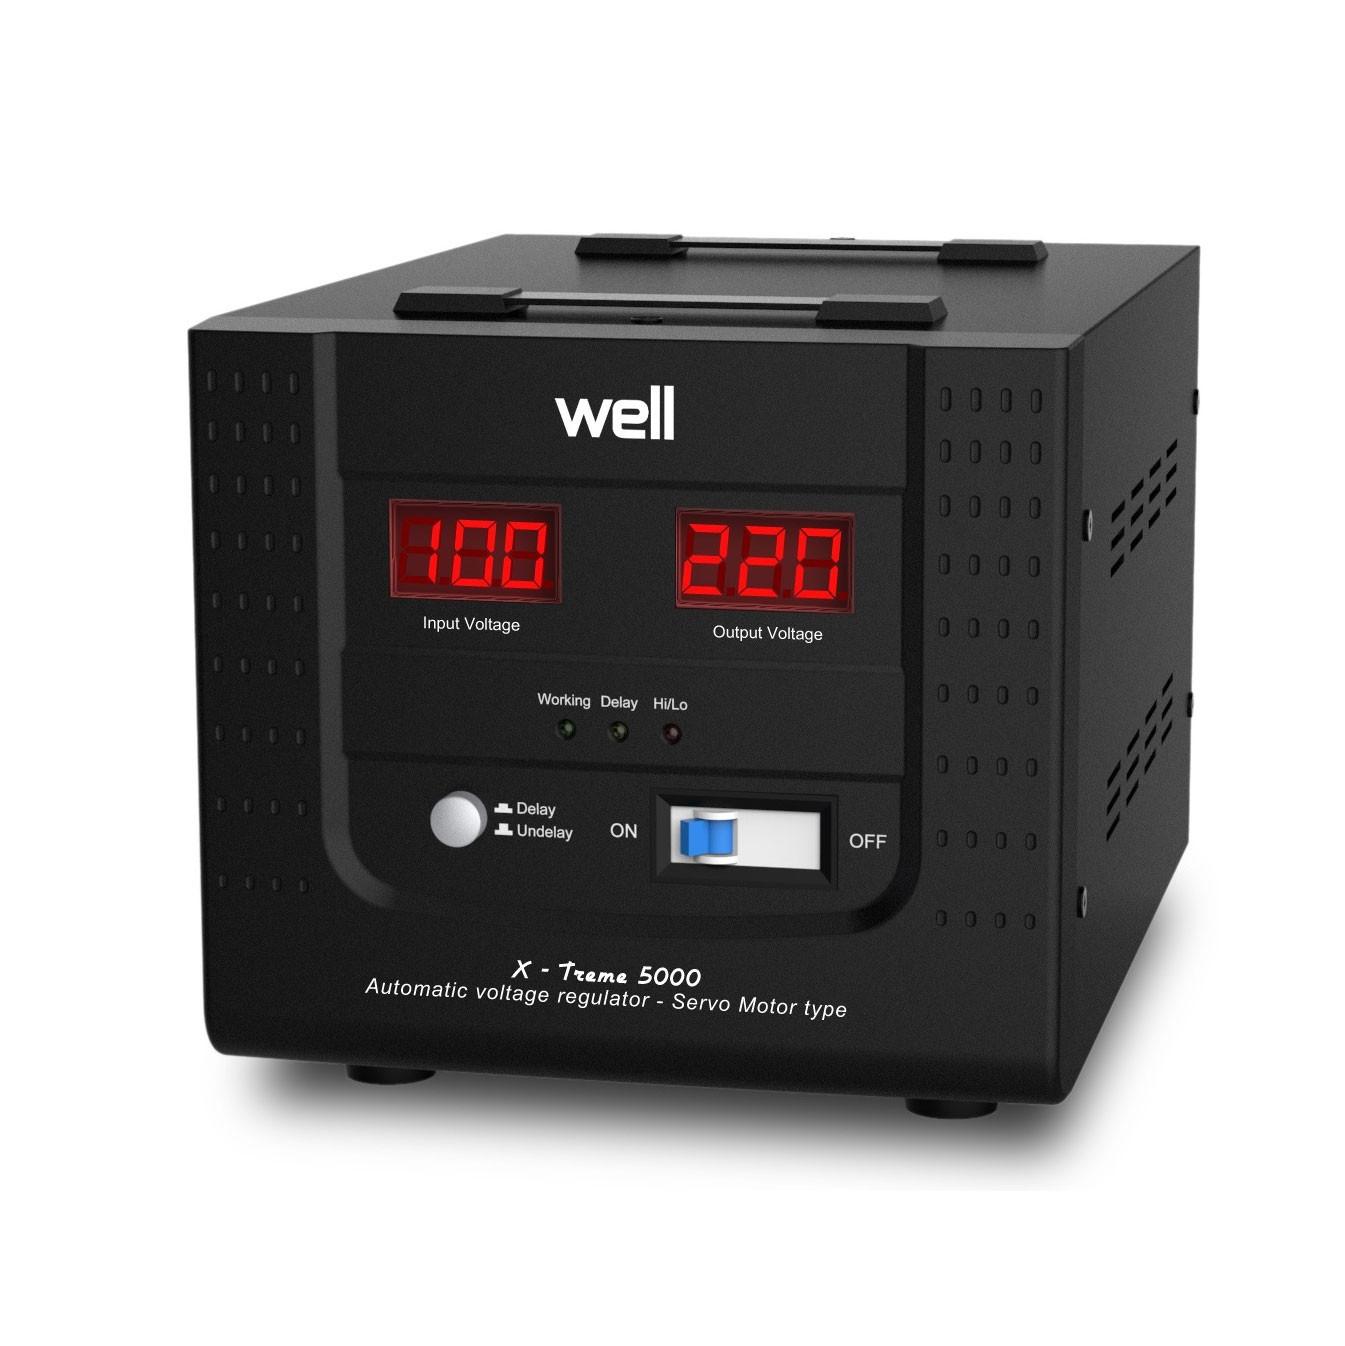 Stabilizator de tensiune cu servomotor, Well AVR-SRV-5000VA-WL, 5000VA / 3000W